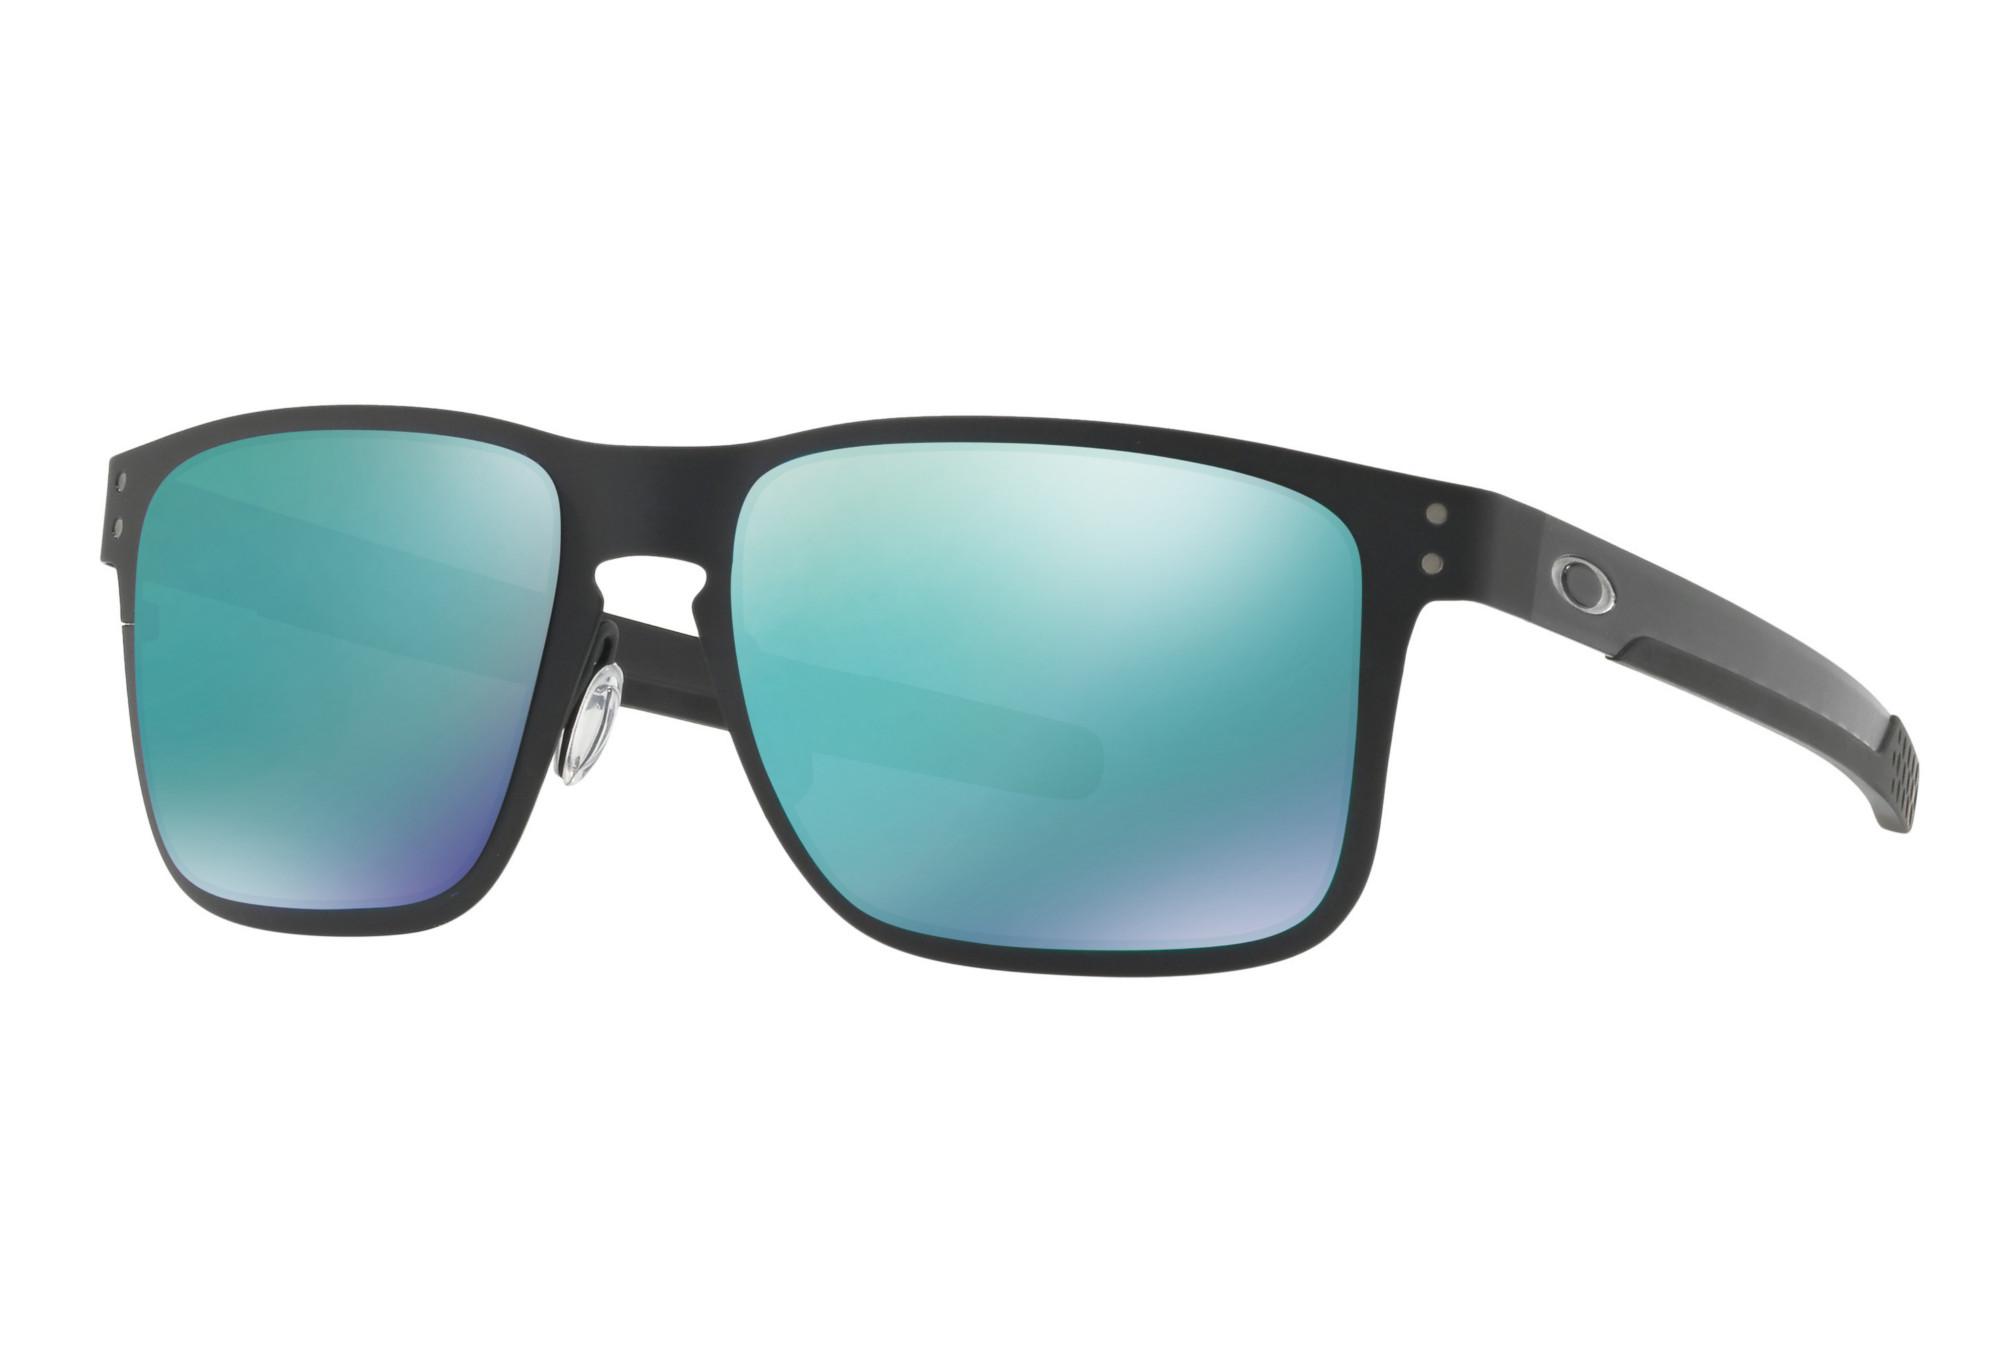 afa70d25a3 OAKLEY Sunglasses Holbrook Metal Matte Black Jade Iridium Ref  OO4123-0455